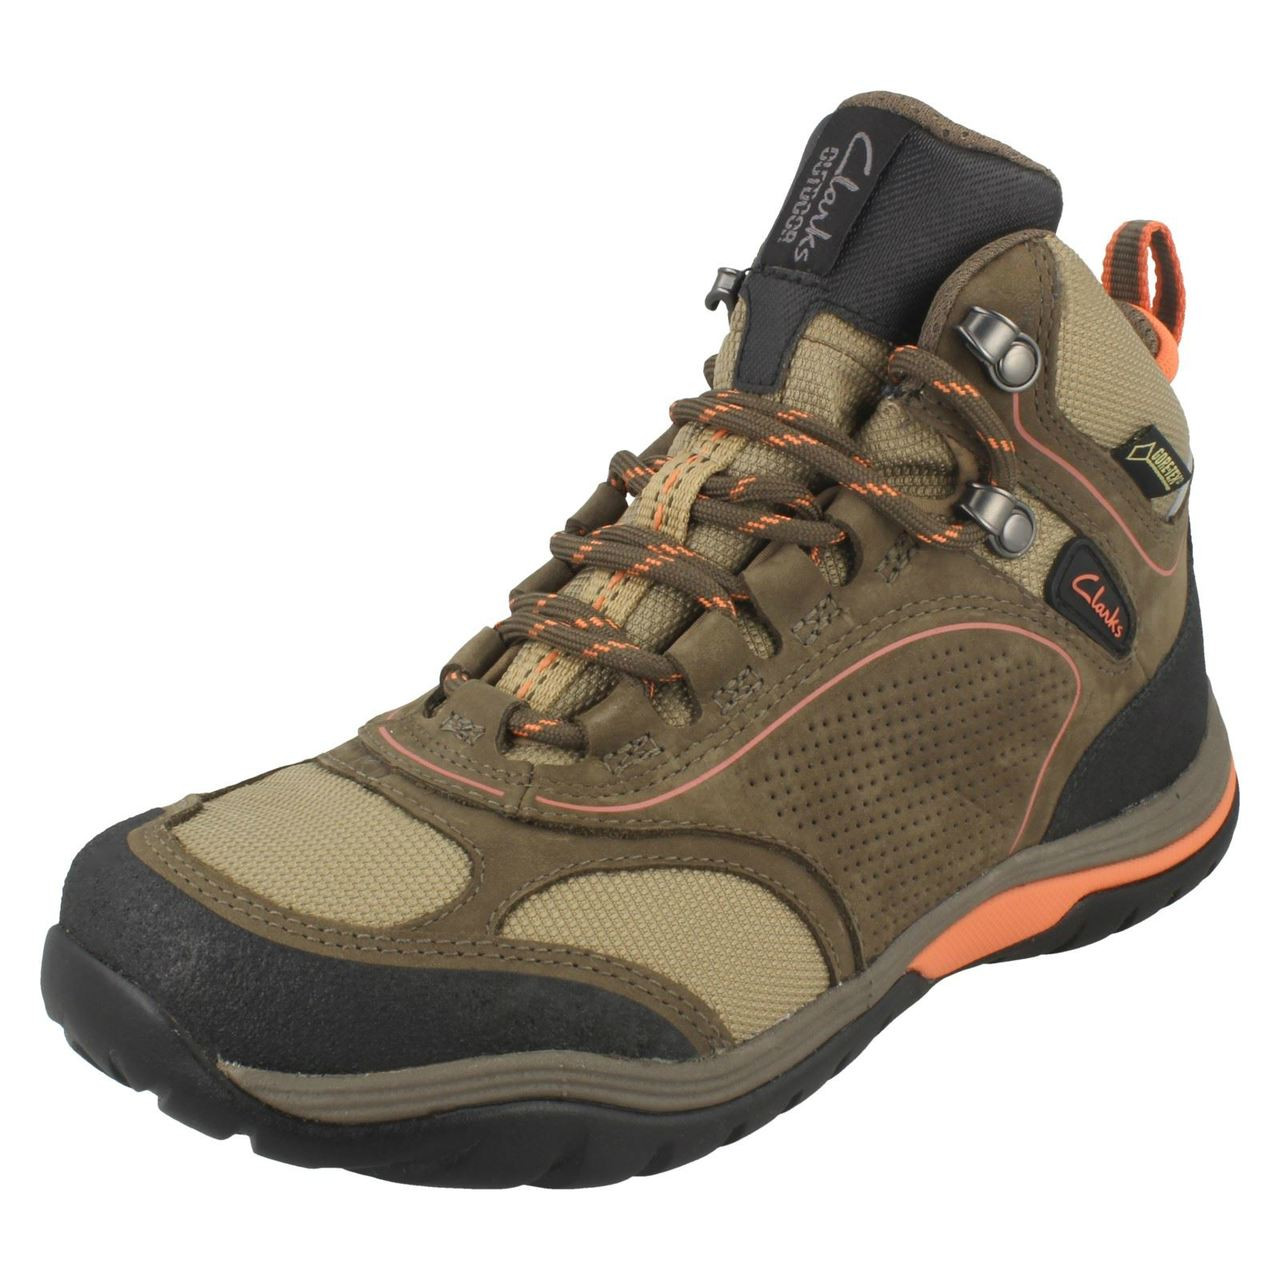 Ladies Clarks Lightweight Walking Boots